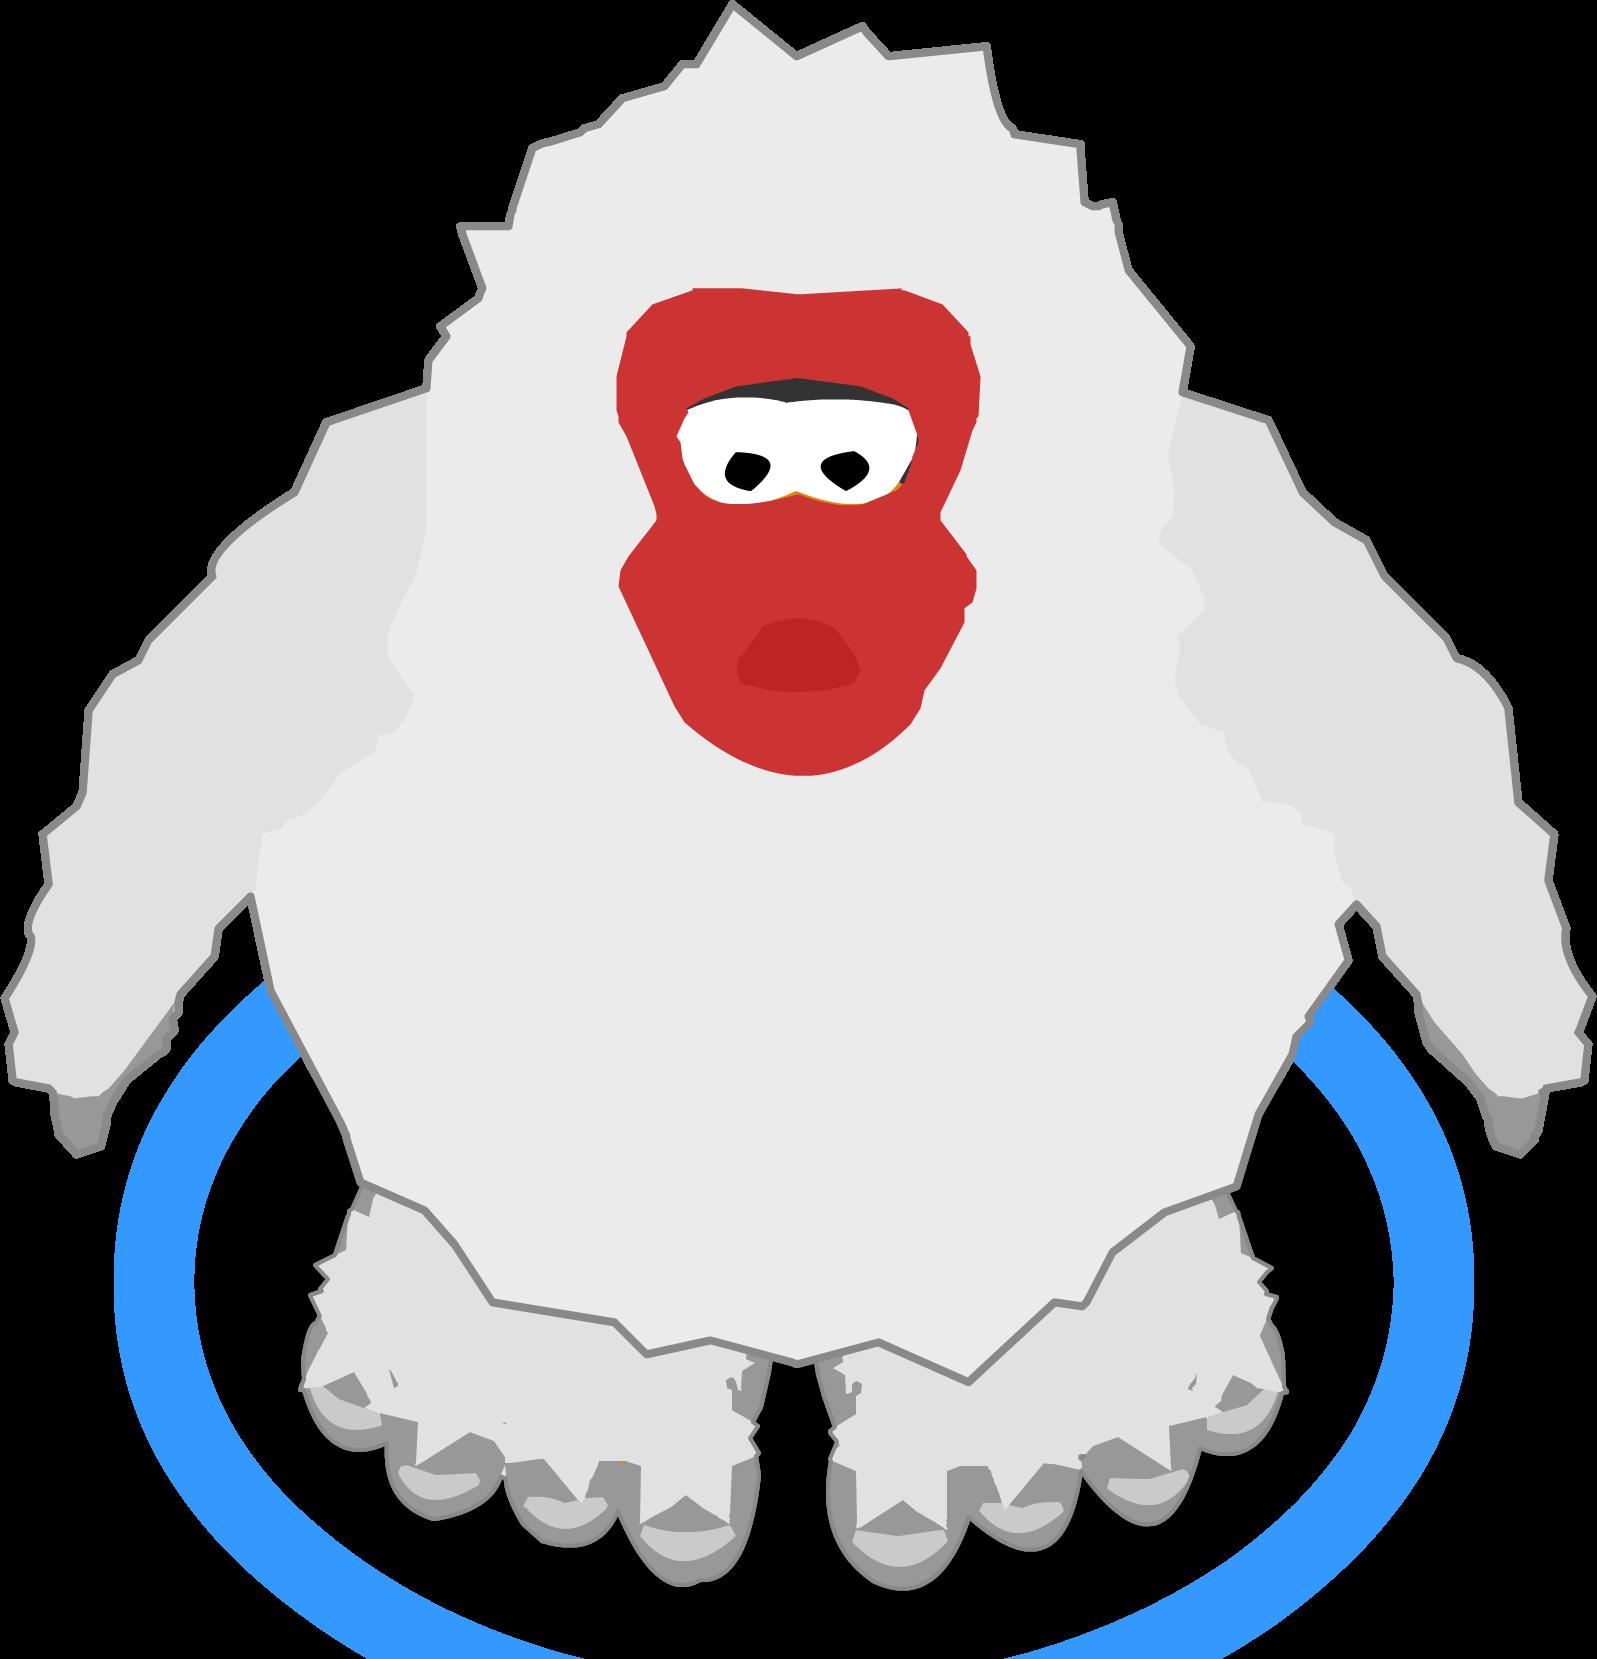 Snow Monkey (character)